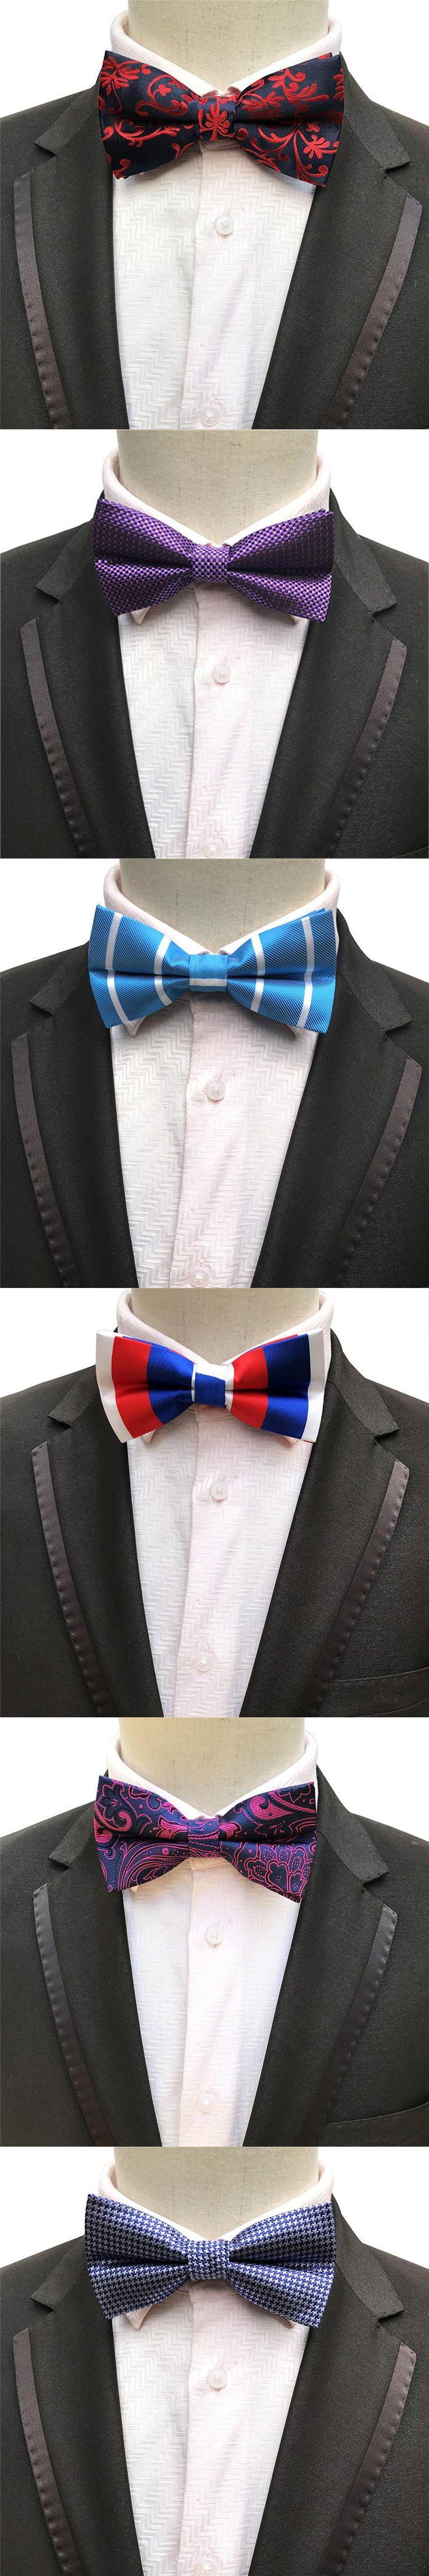 Mantieqingway Fashion Brand Bow Tie Groom Wedding Bowtie Vestidos Male Popular Striped Bow Ties for Men Polyester Bowties Tuxedo